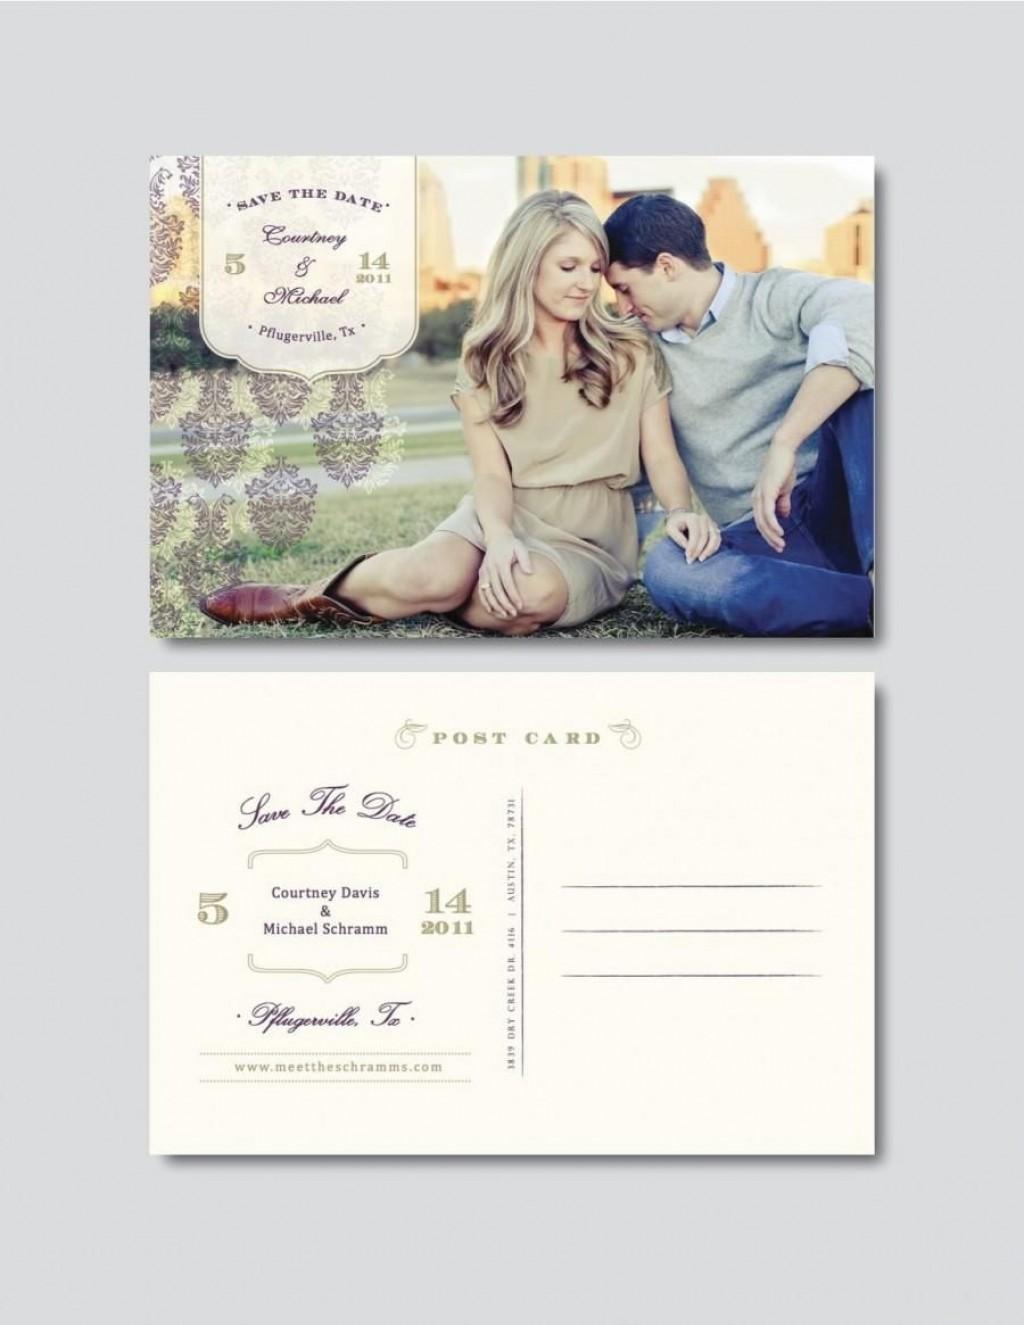 009 Surprising Save The Date Postcard Template Photo  Diy Free BirthdayLarge